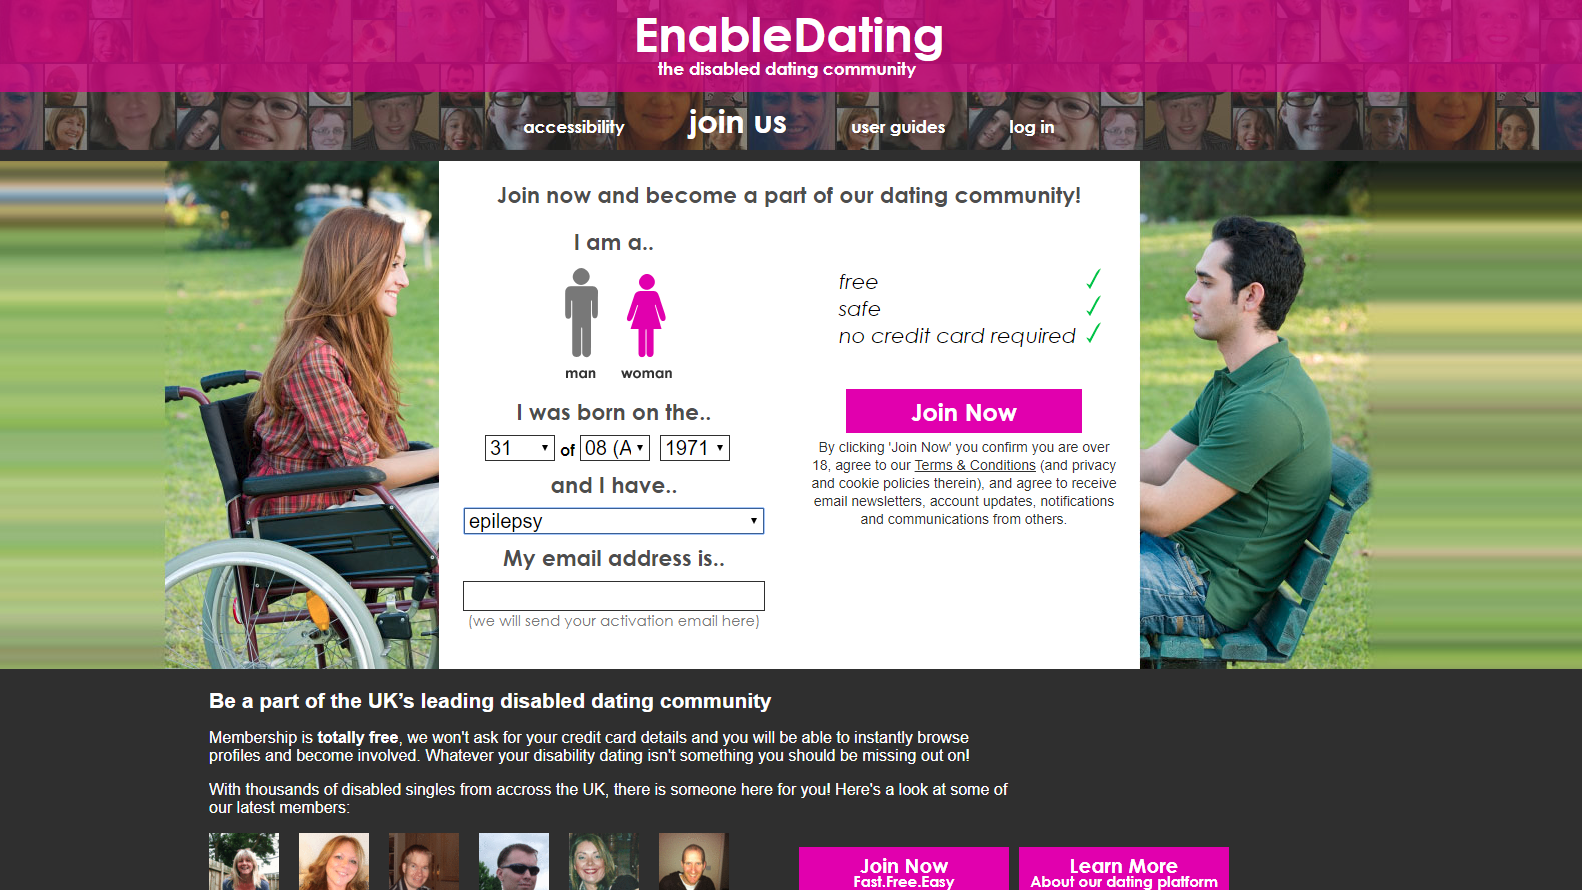 Radio rai isoradio online dating